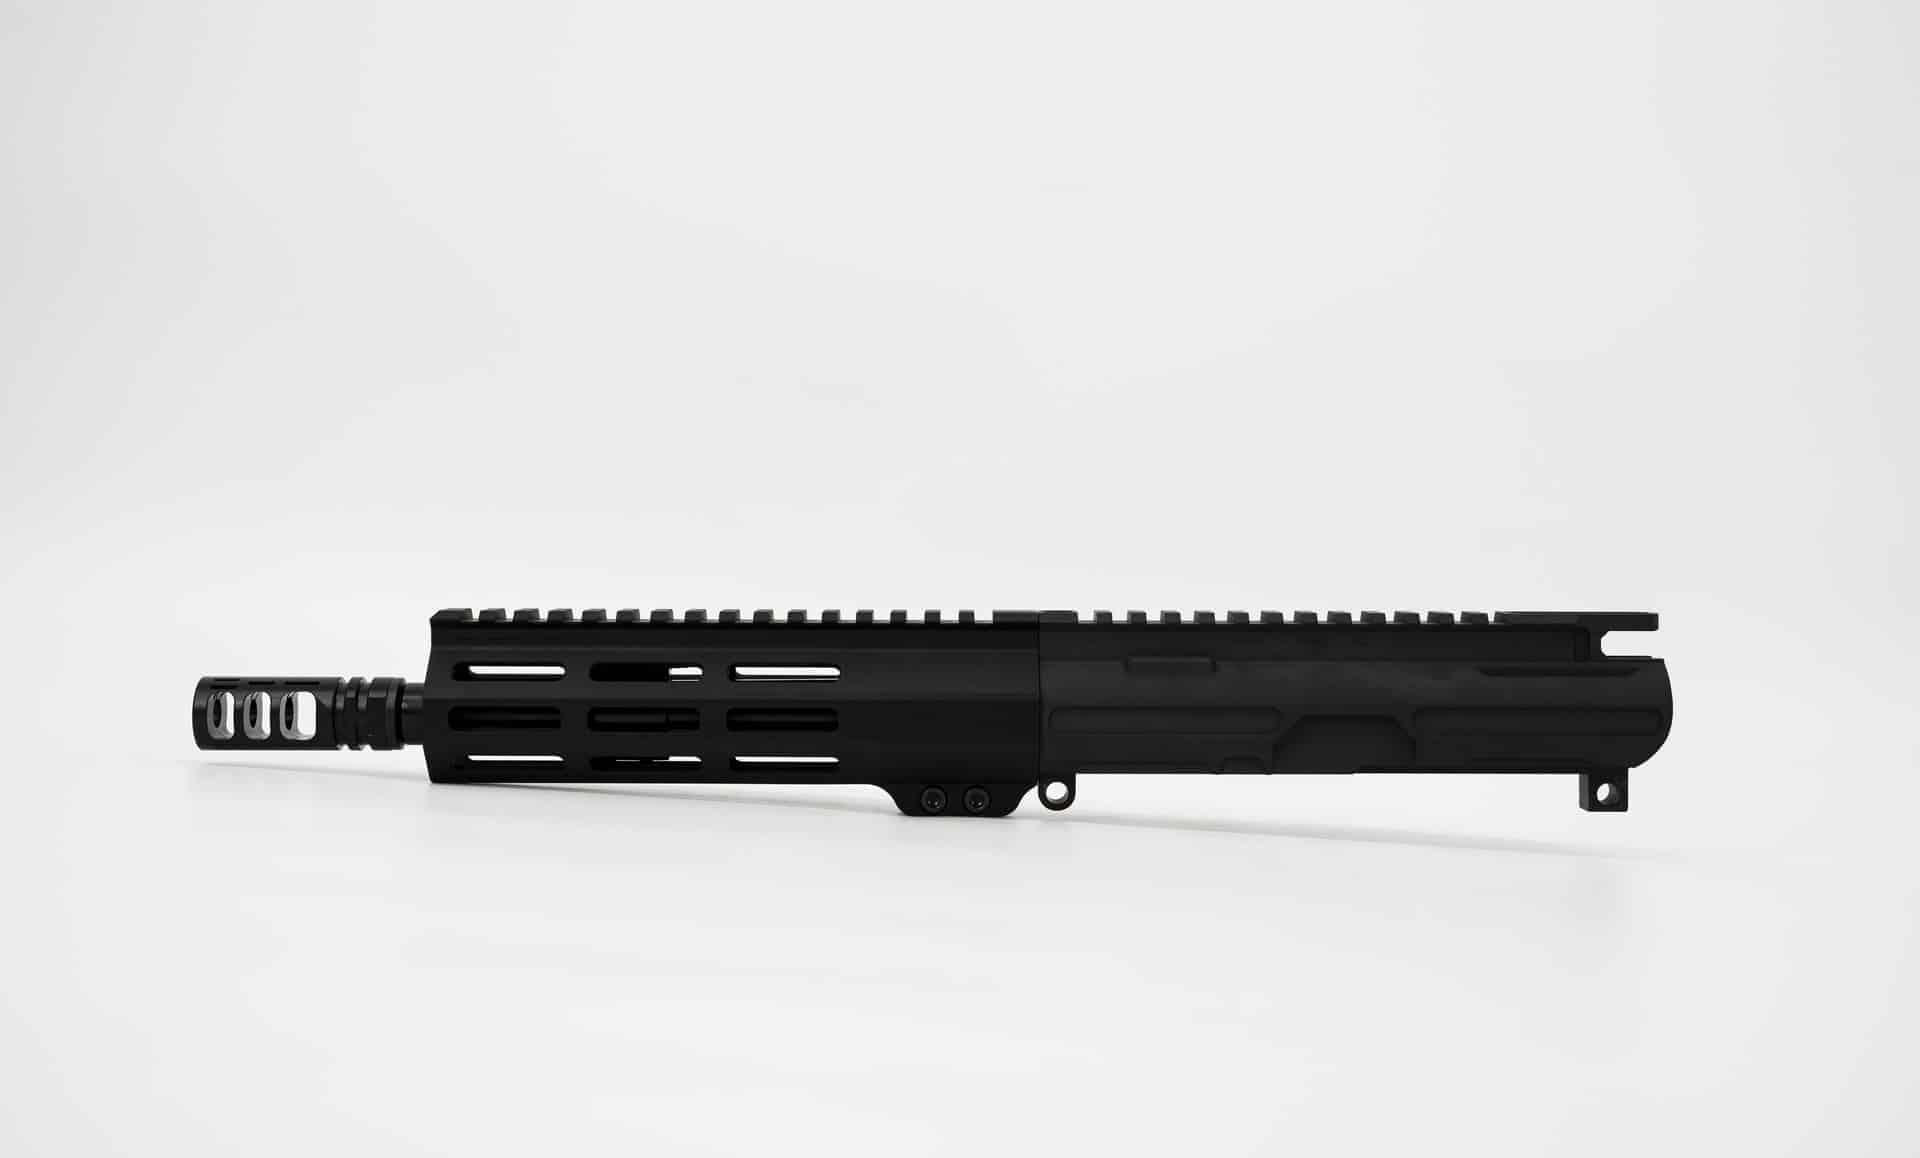 300 blackout billet UPPER 8 inch MLOK SBA3 Andro Corp AR15 Pistol